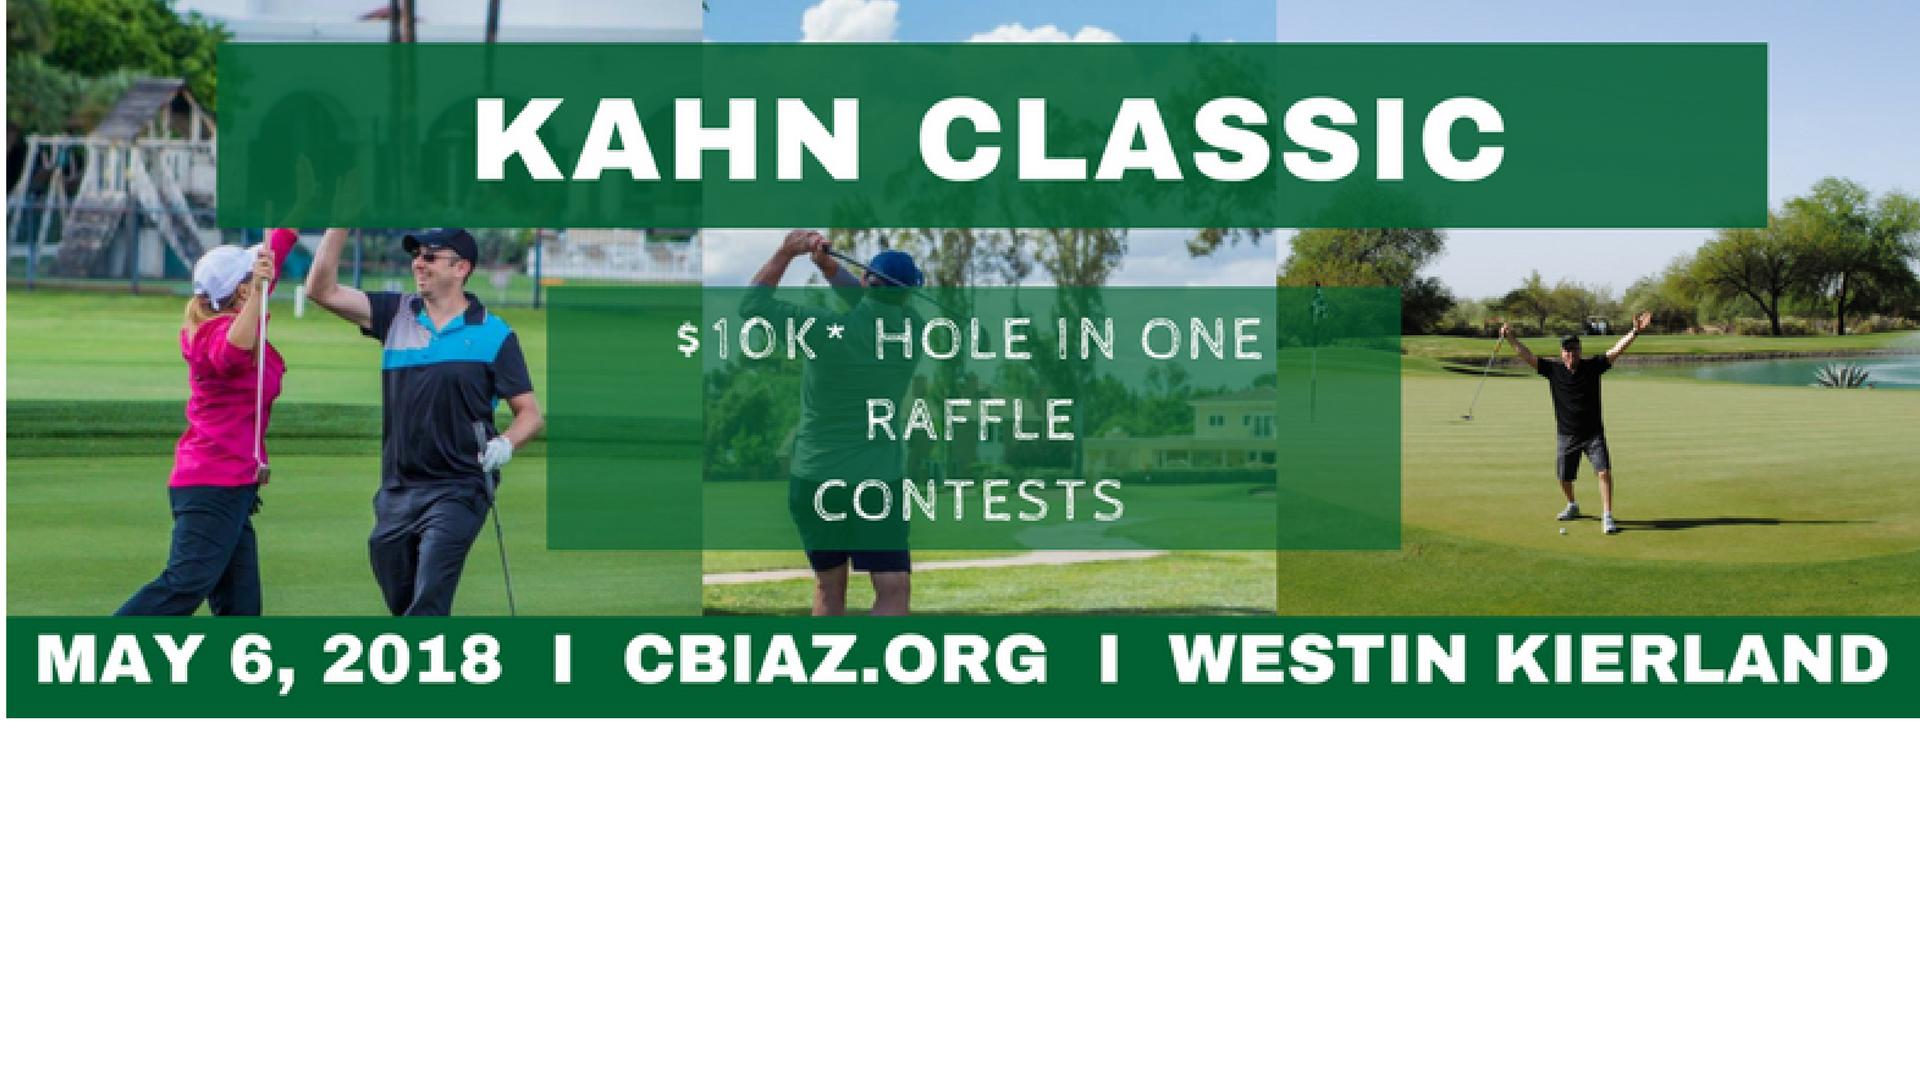 Kahn Classic